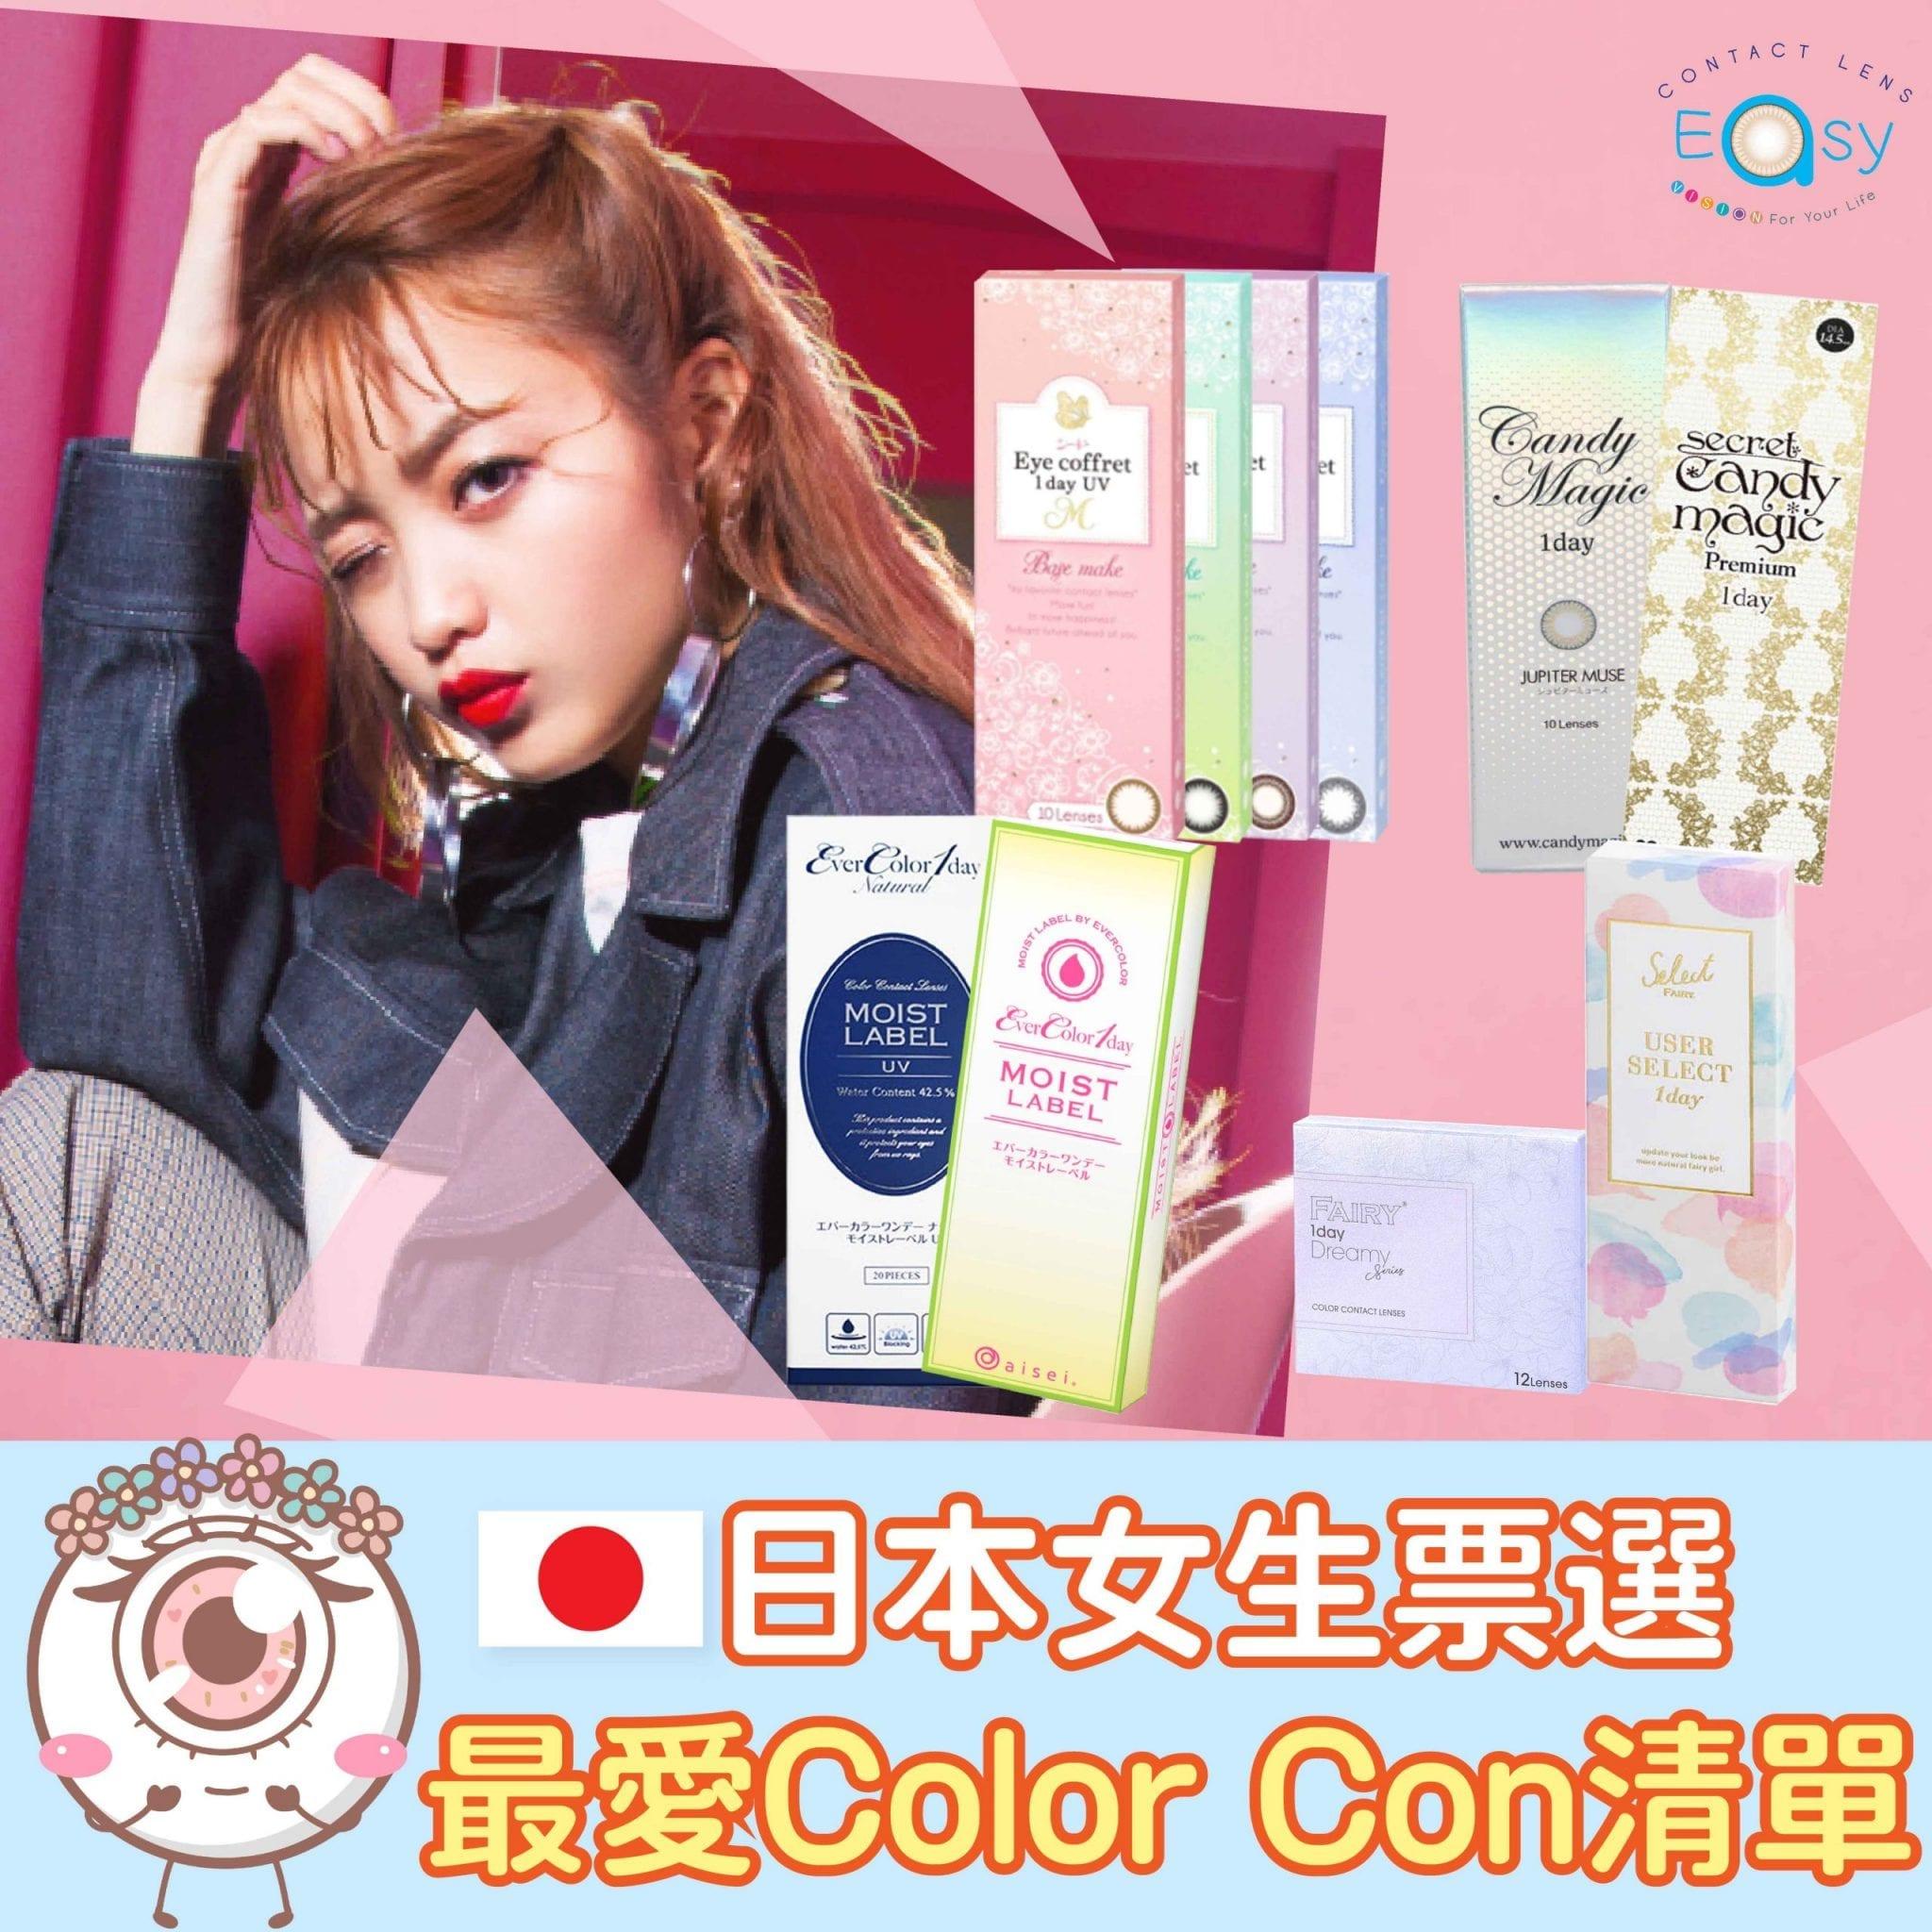 遊日必讀:日本女生票選最愛Color Con清單